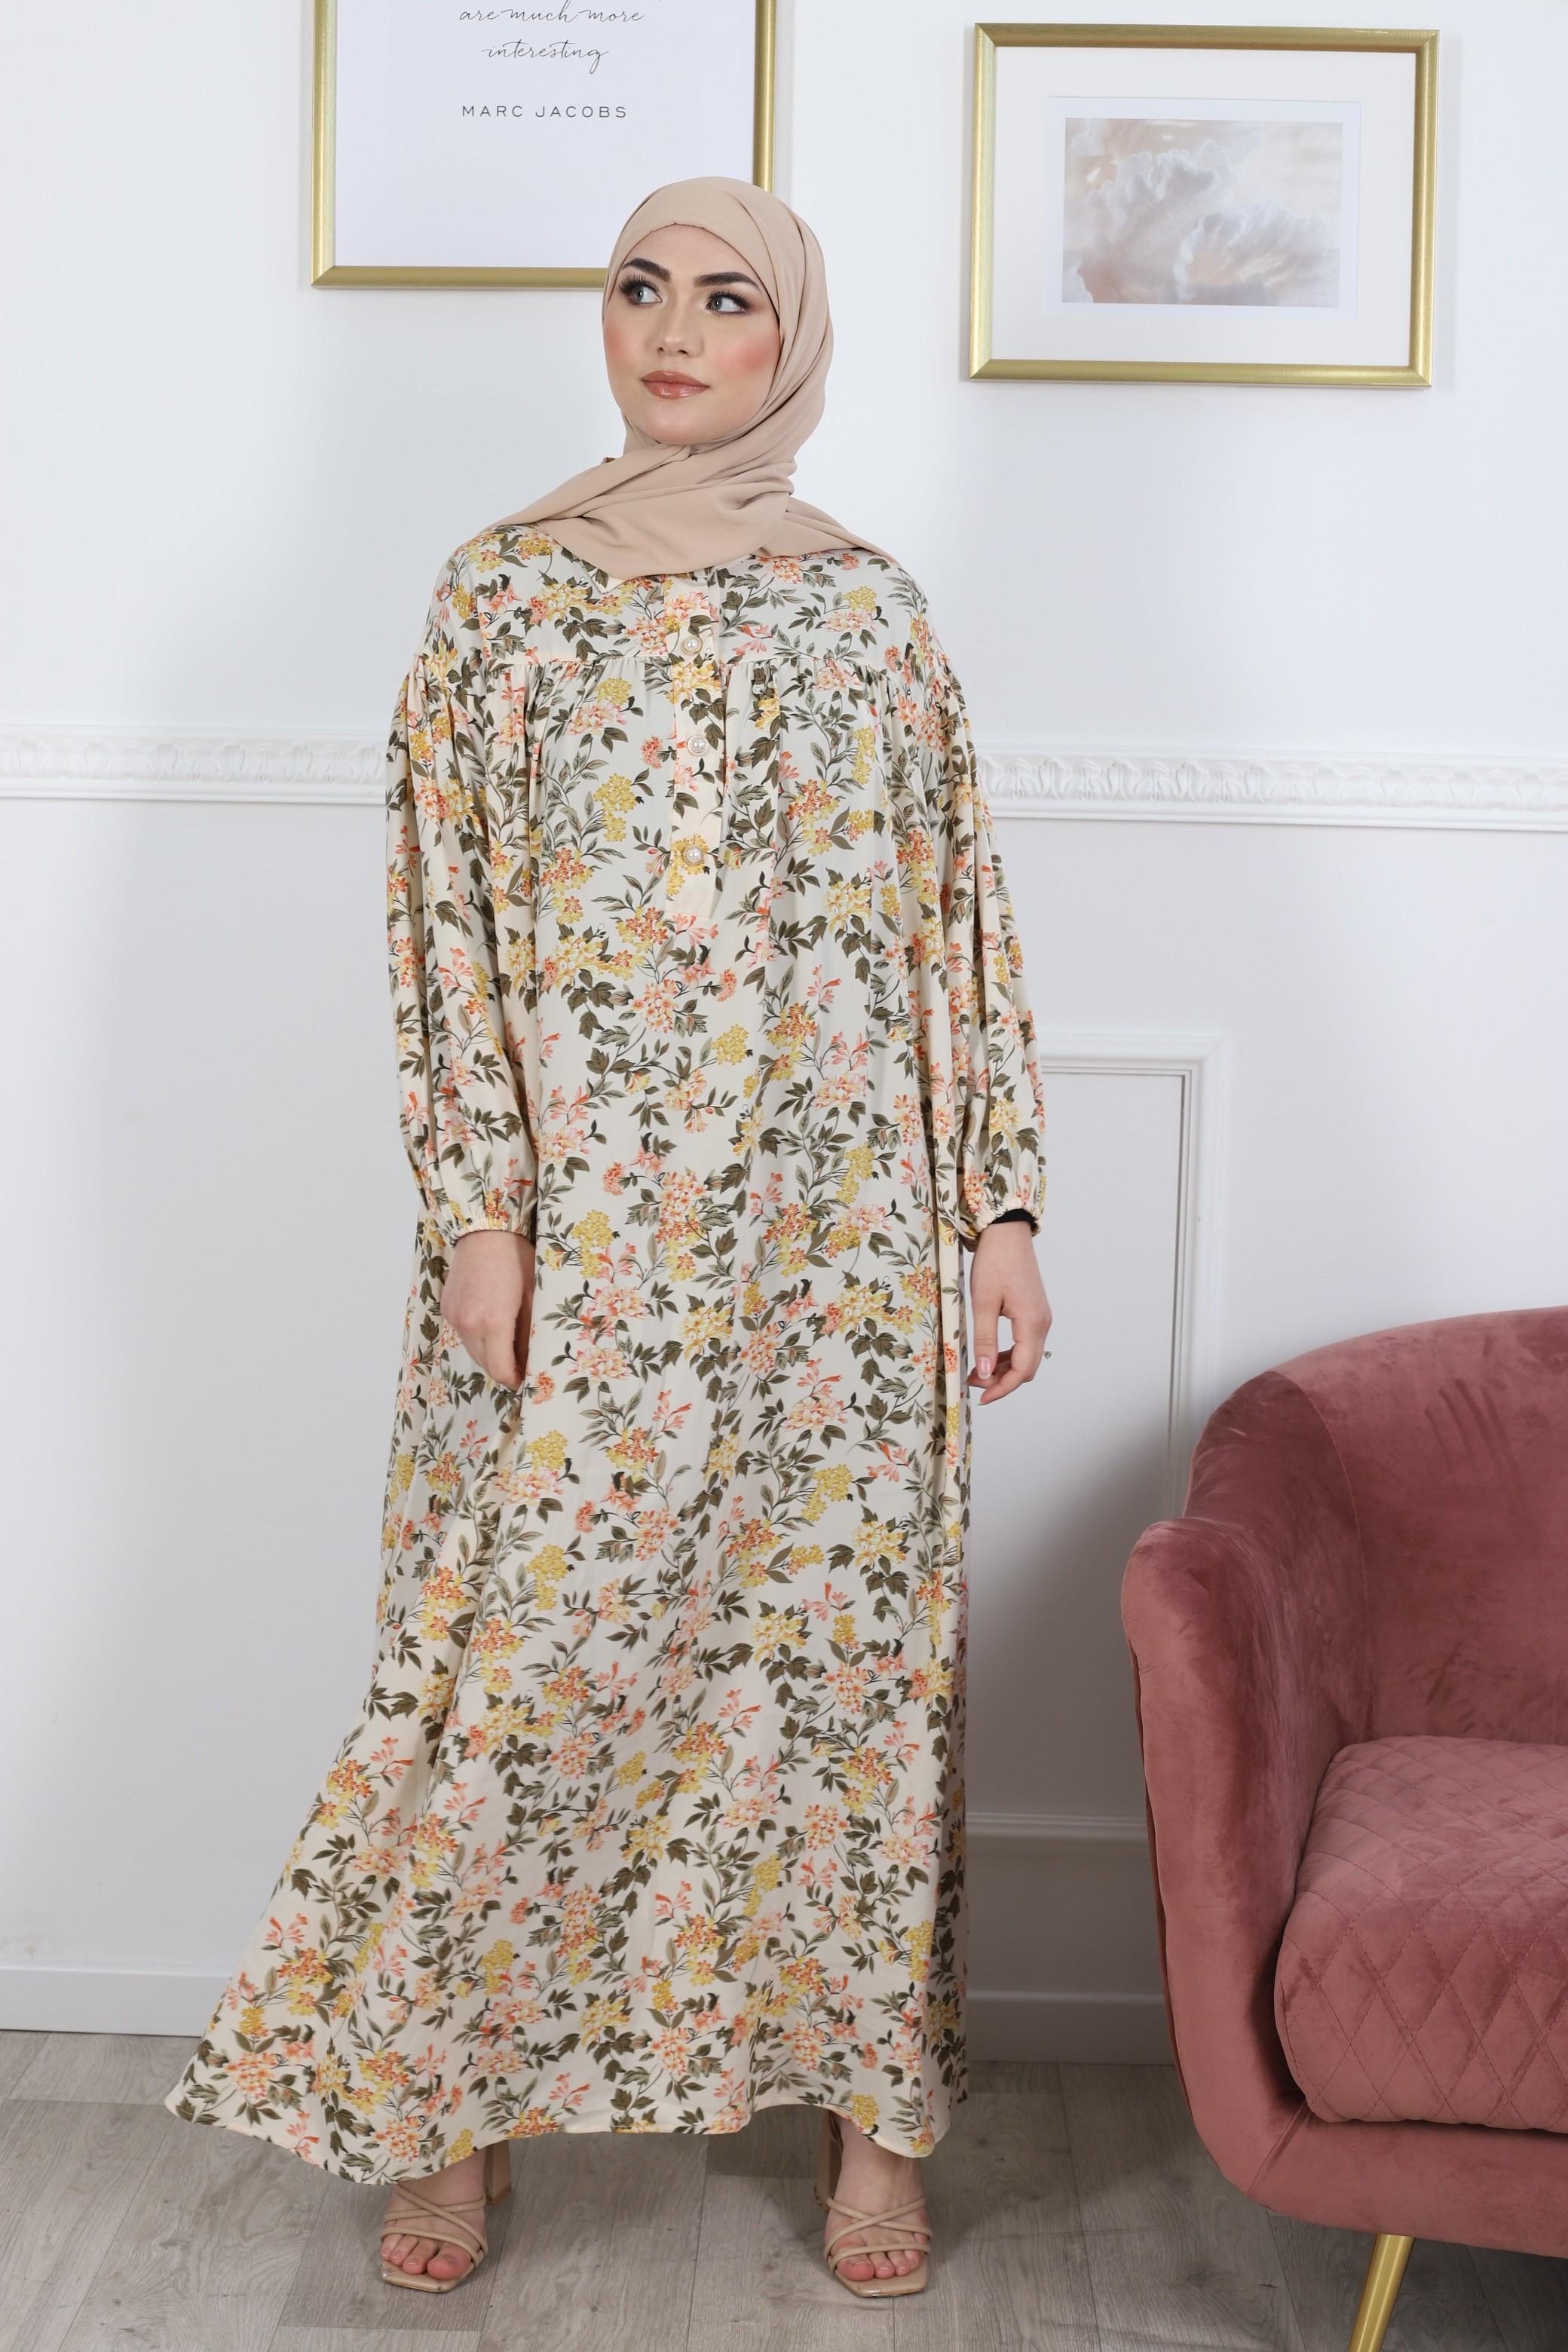 Robe fleurie yellow